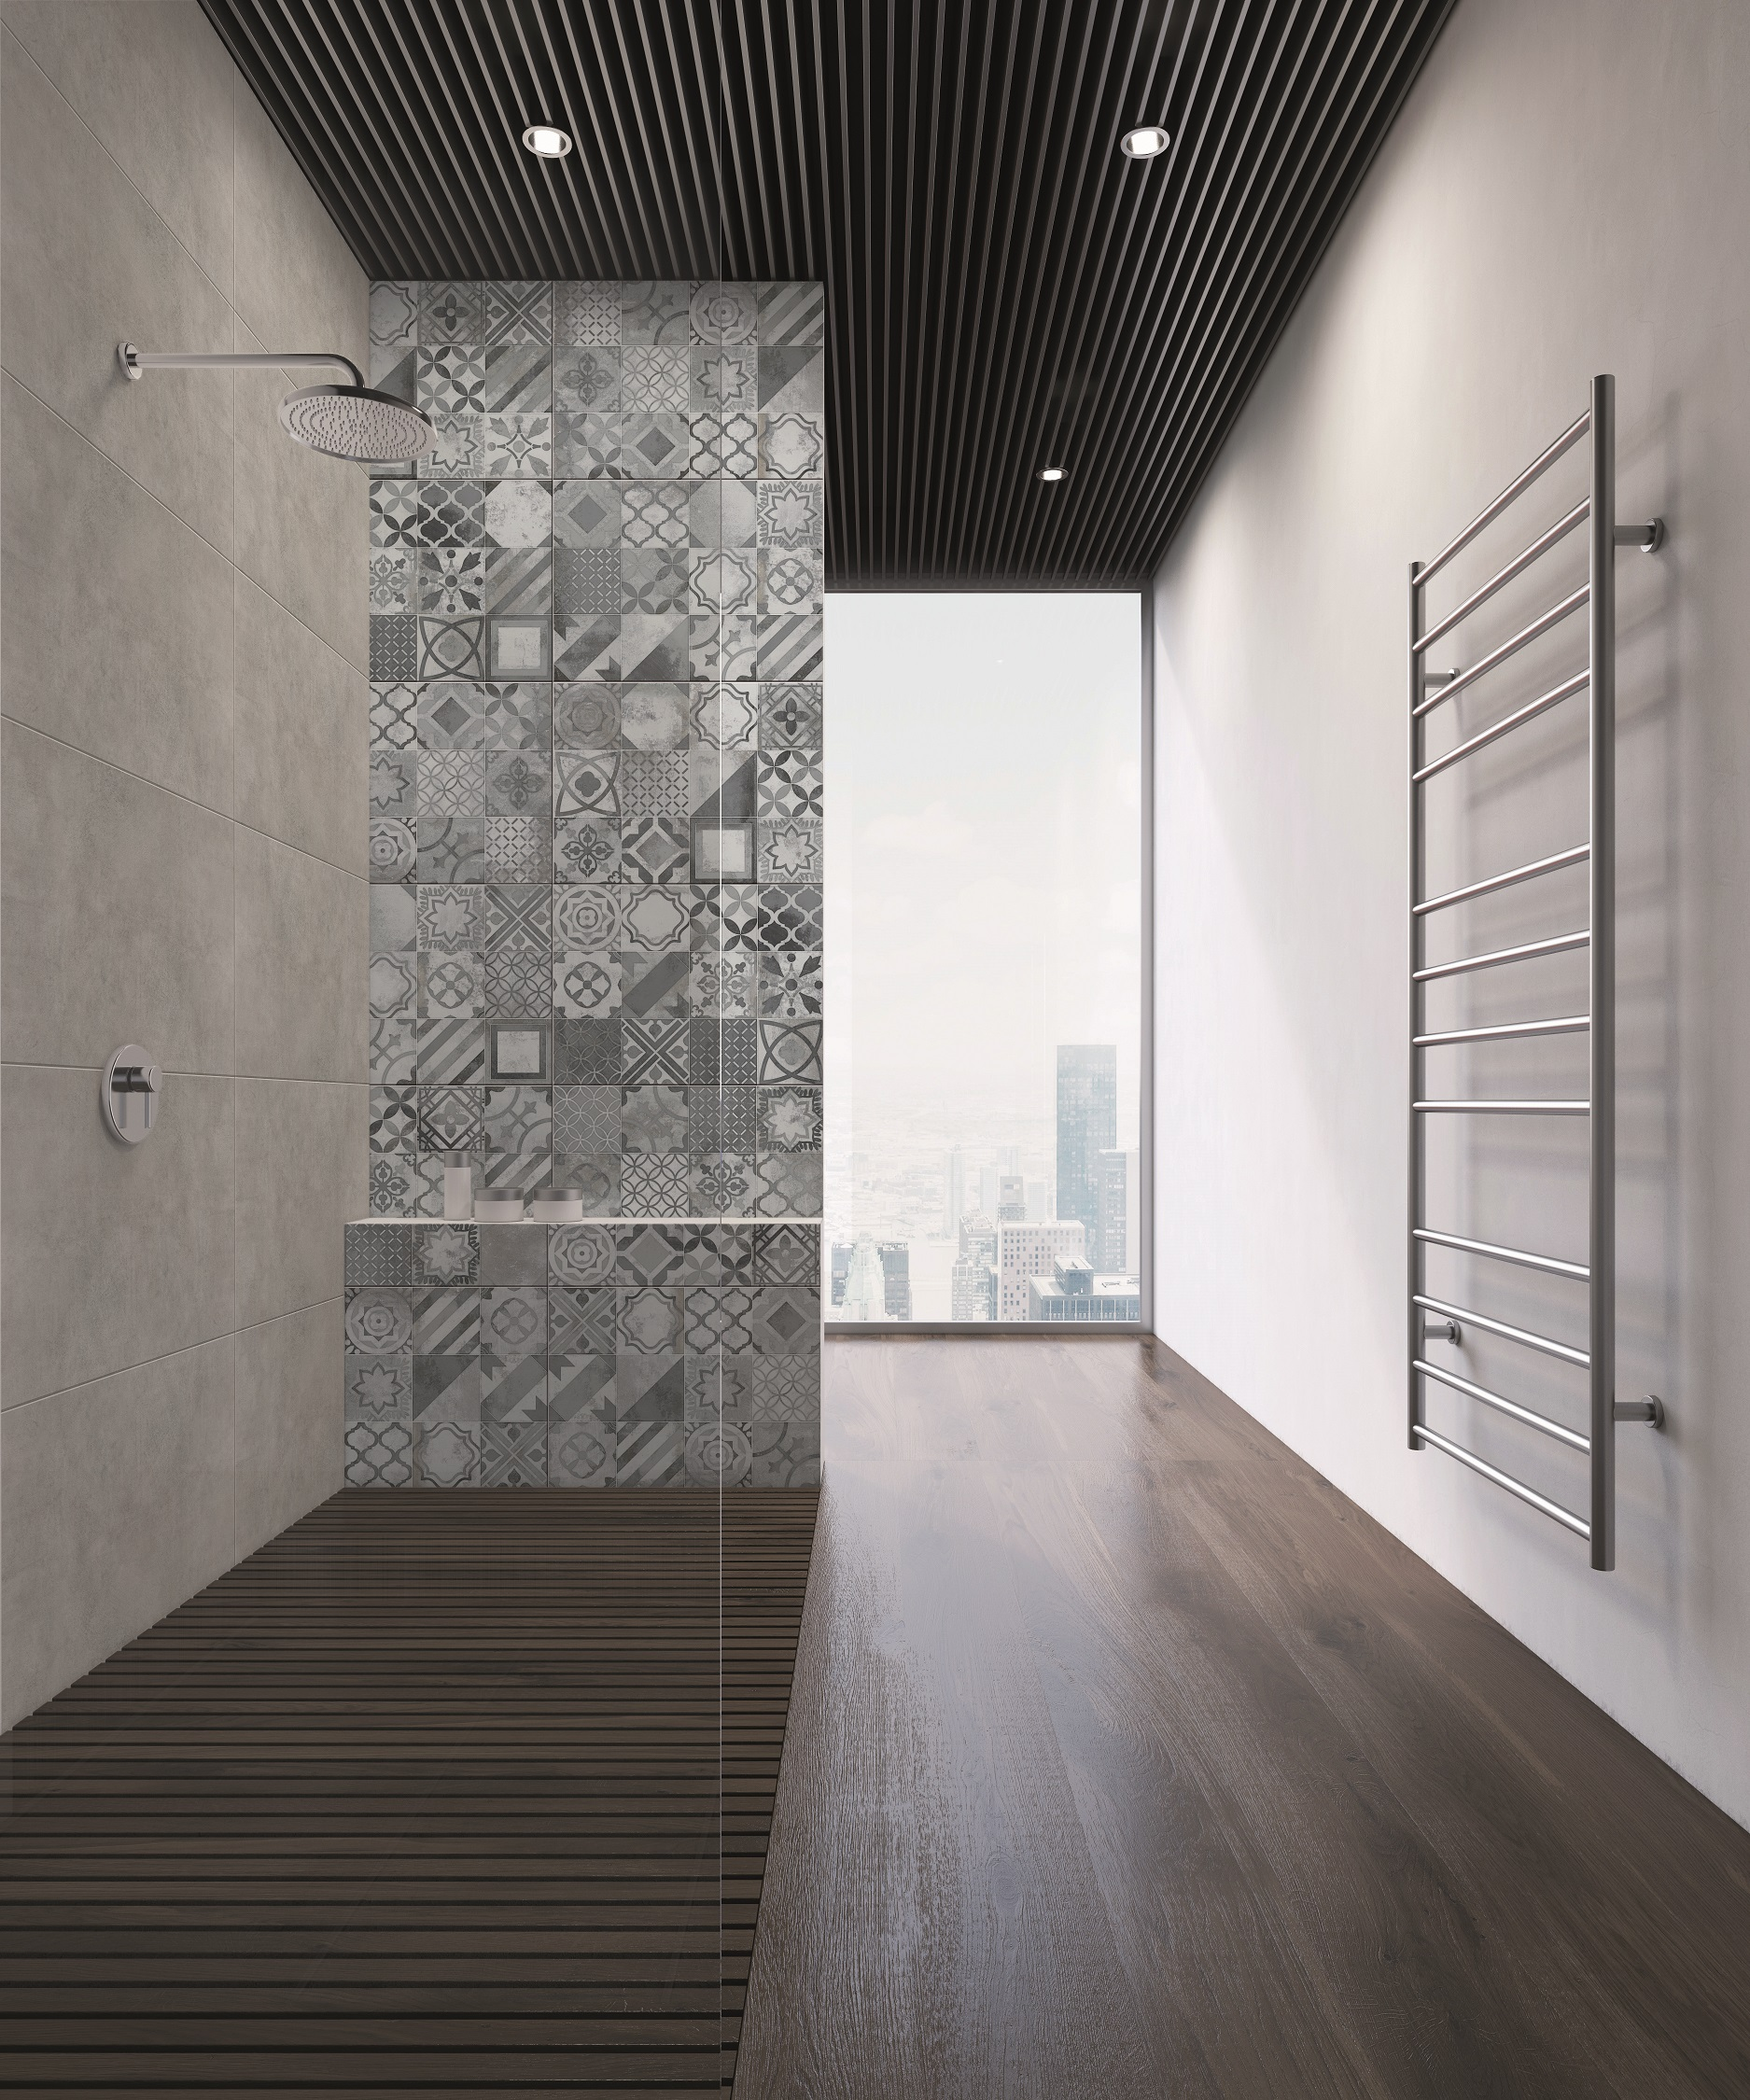 A65 Vinta - Masq Revela Tiles Premium combined with Orlando